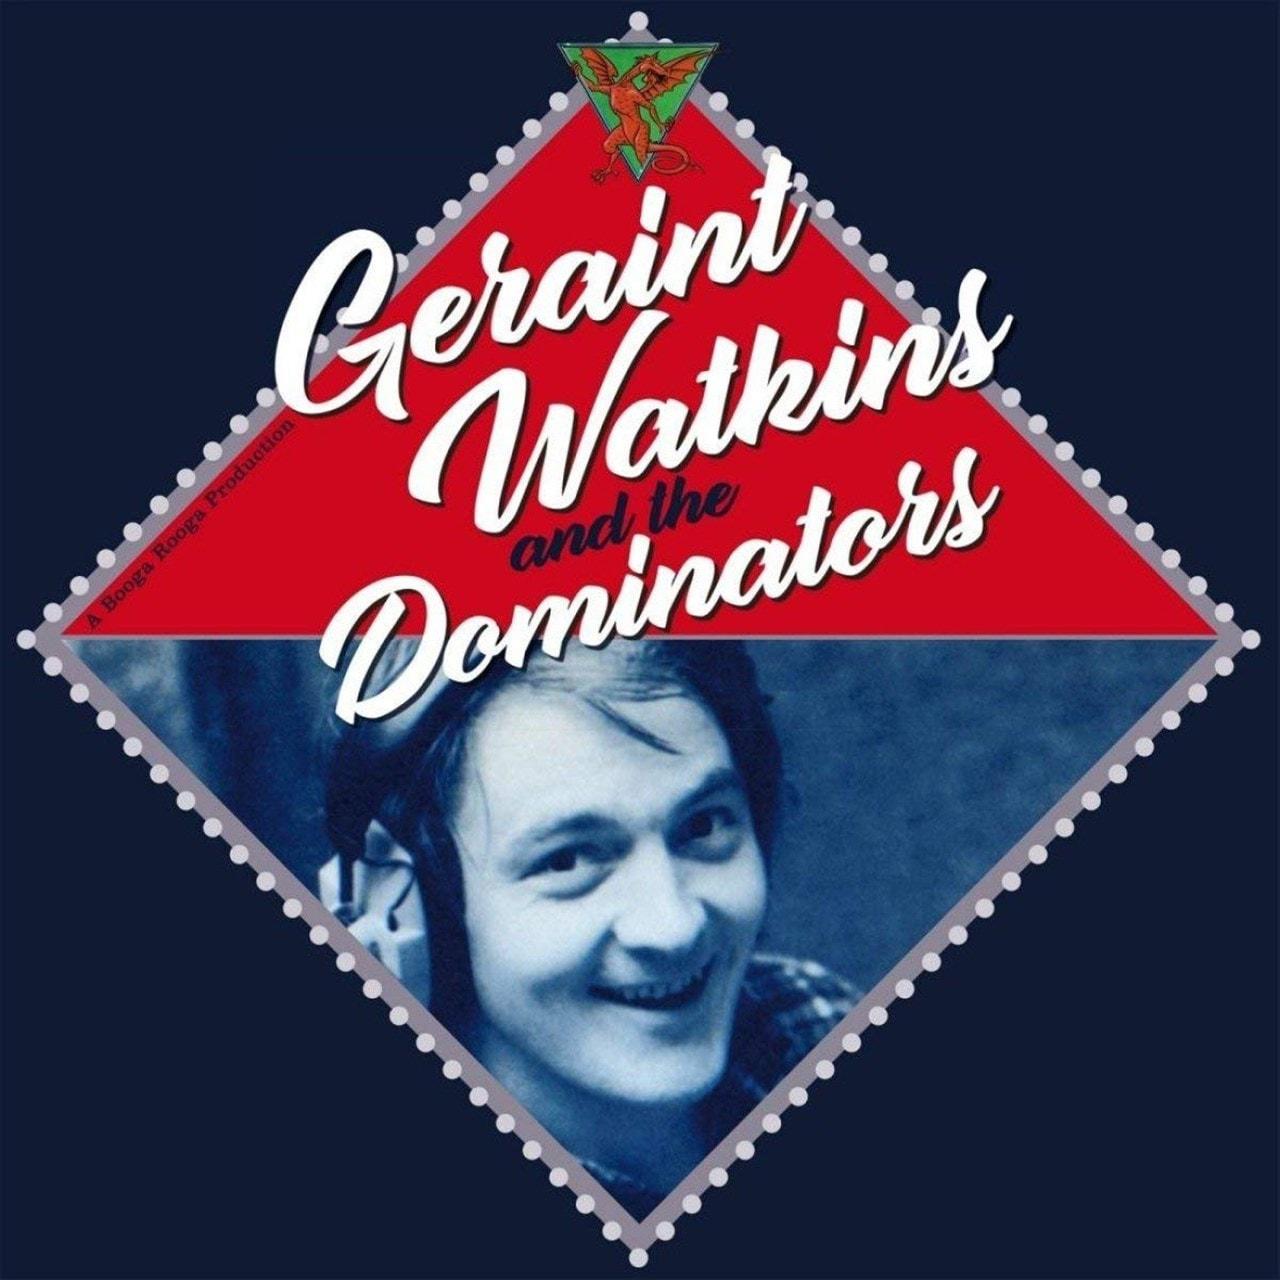 Geraint Watkins & the Dominators - 1